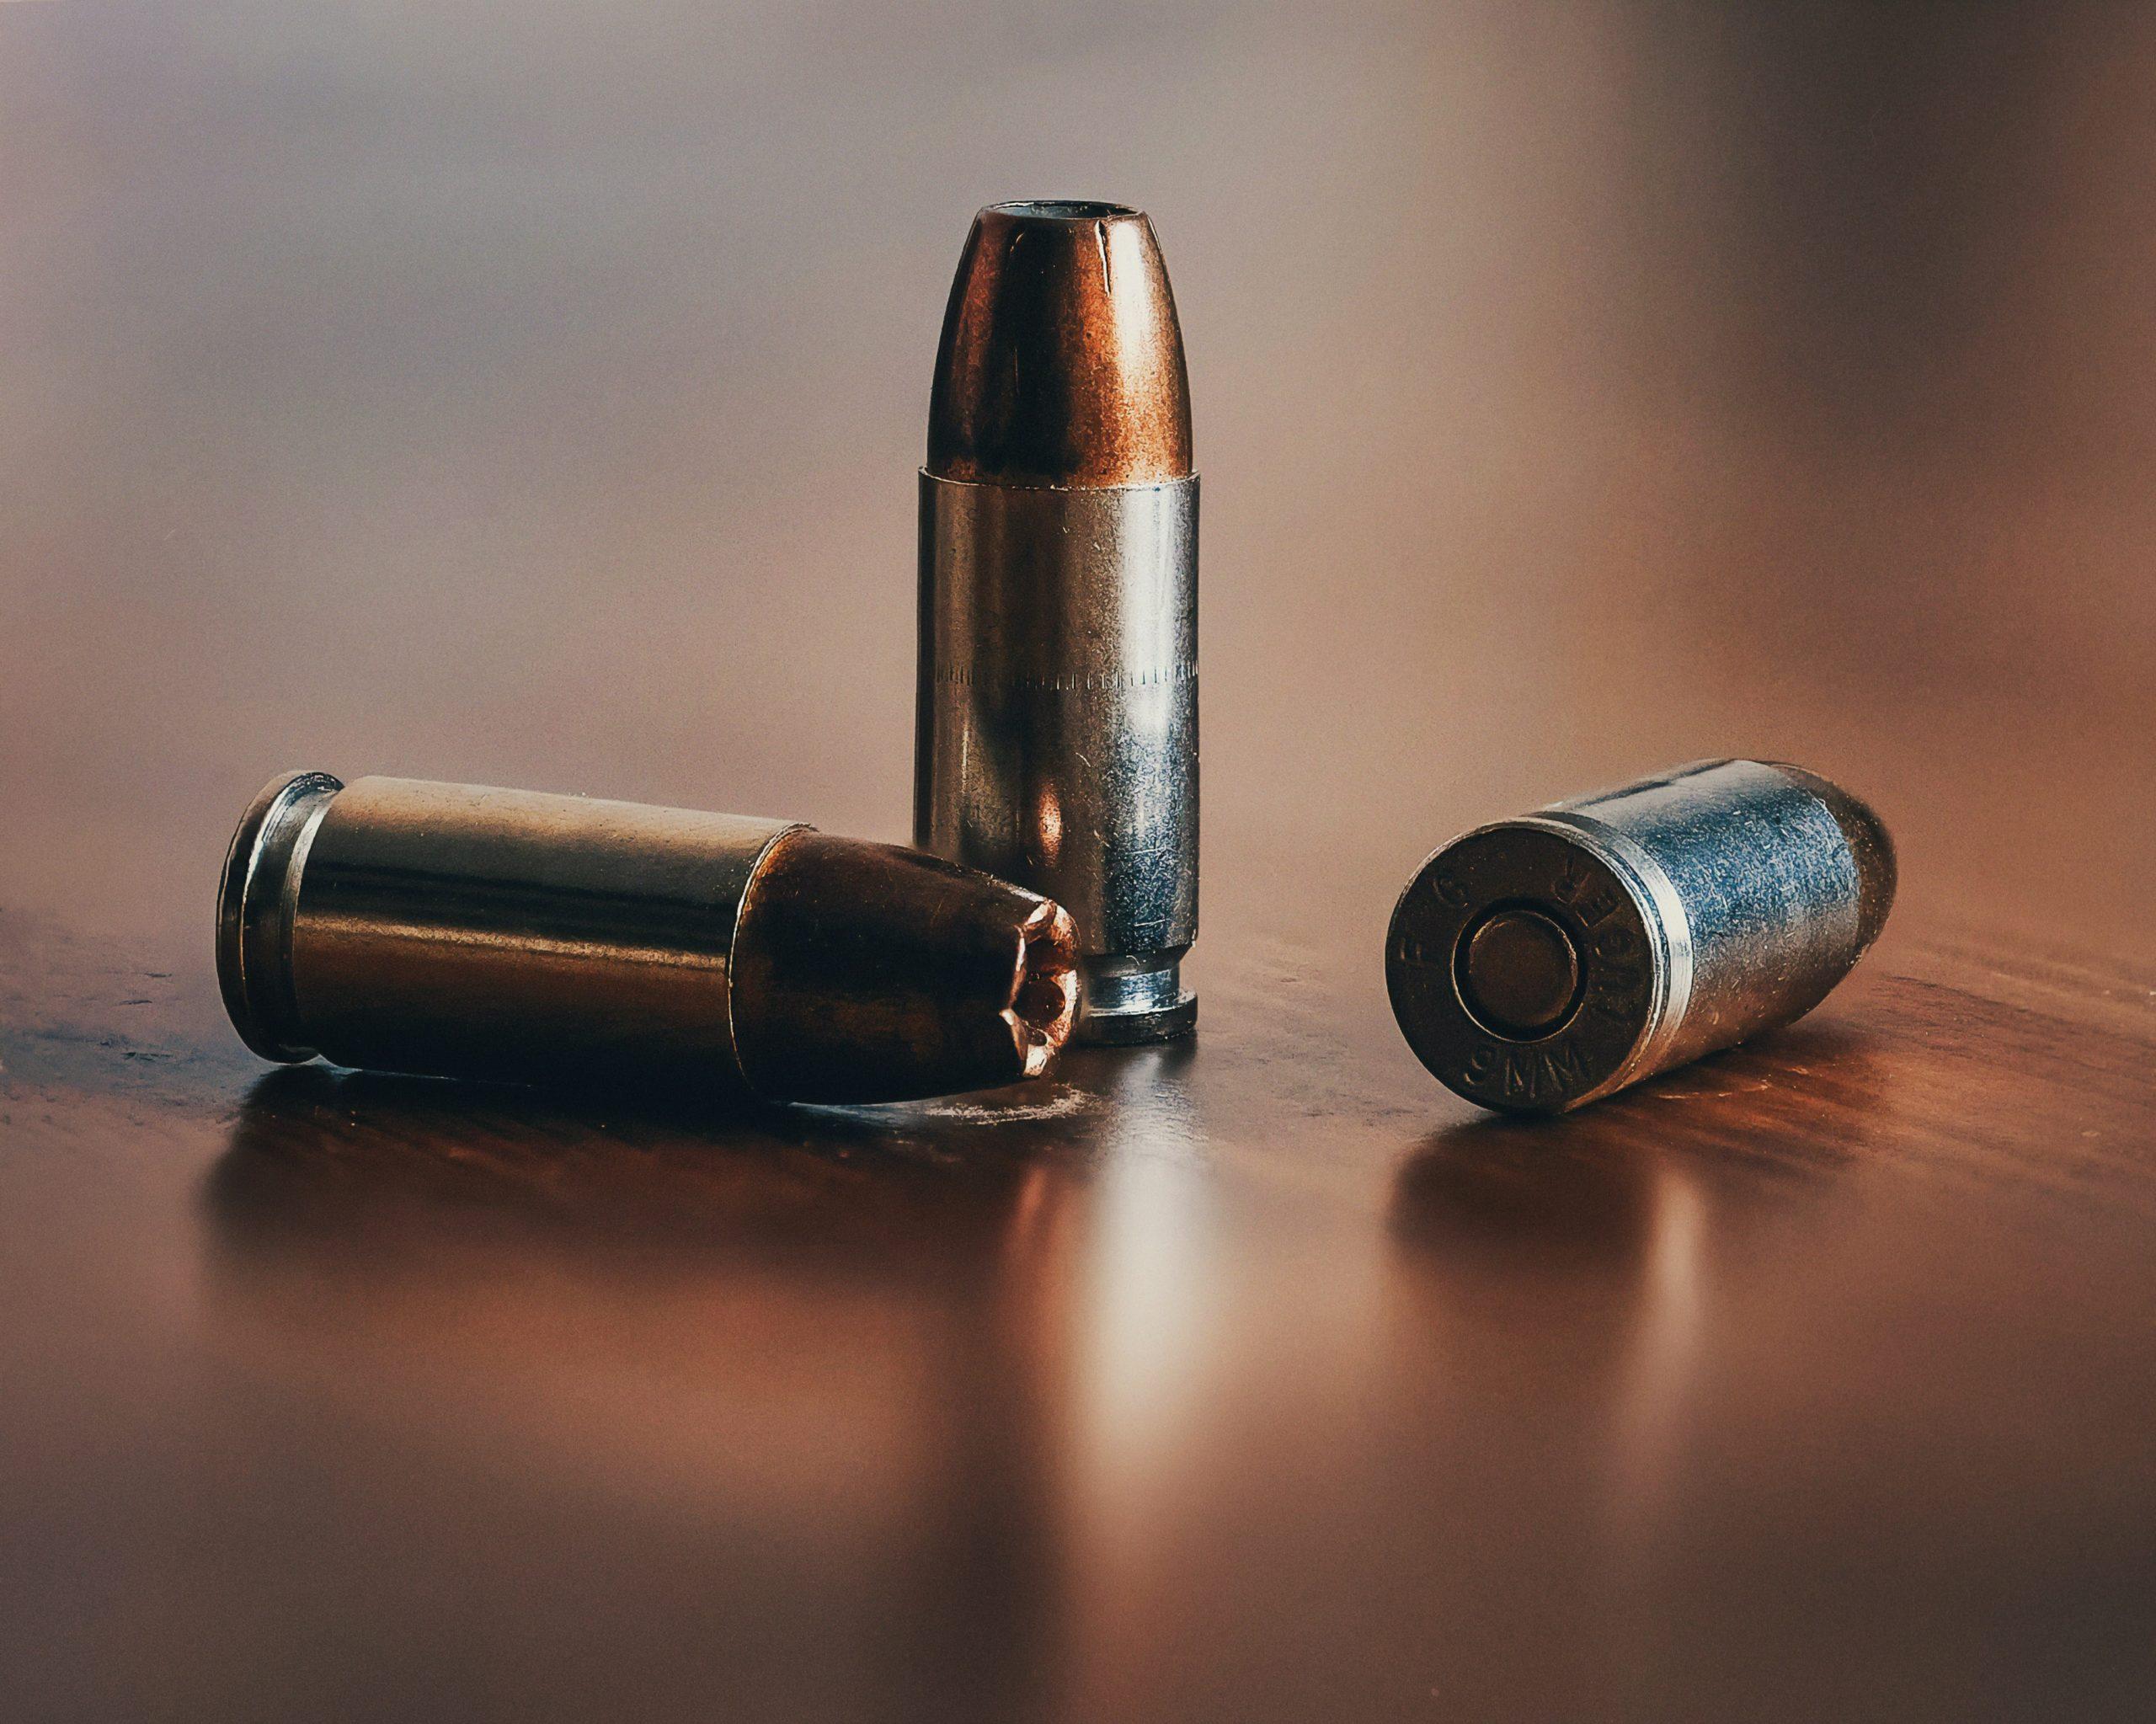 Top 7 Best Self-Defense Ammo Reviews